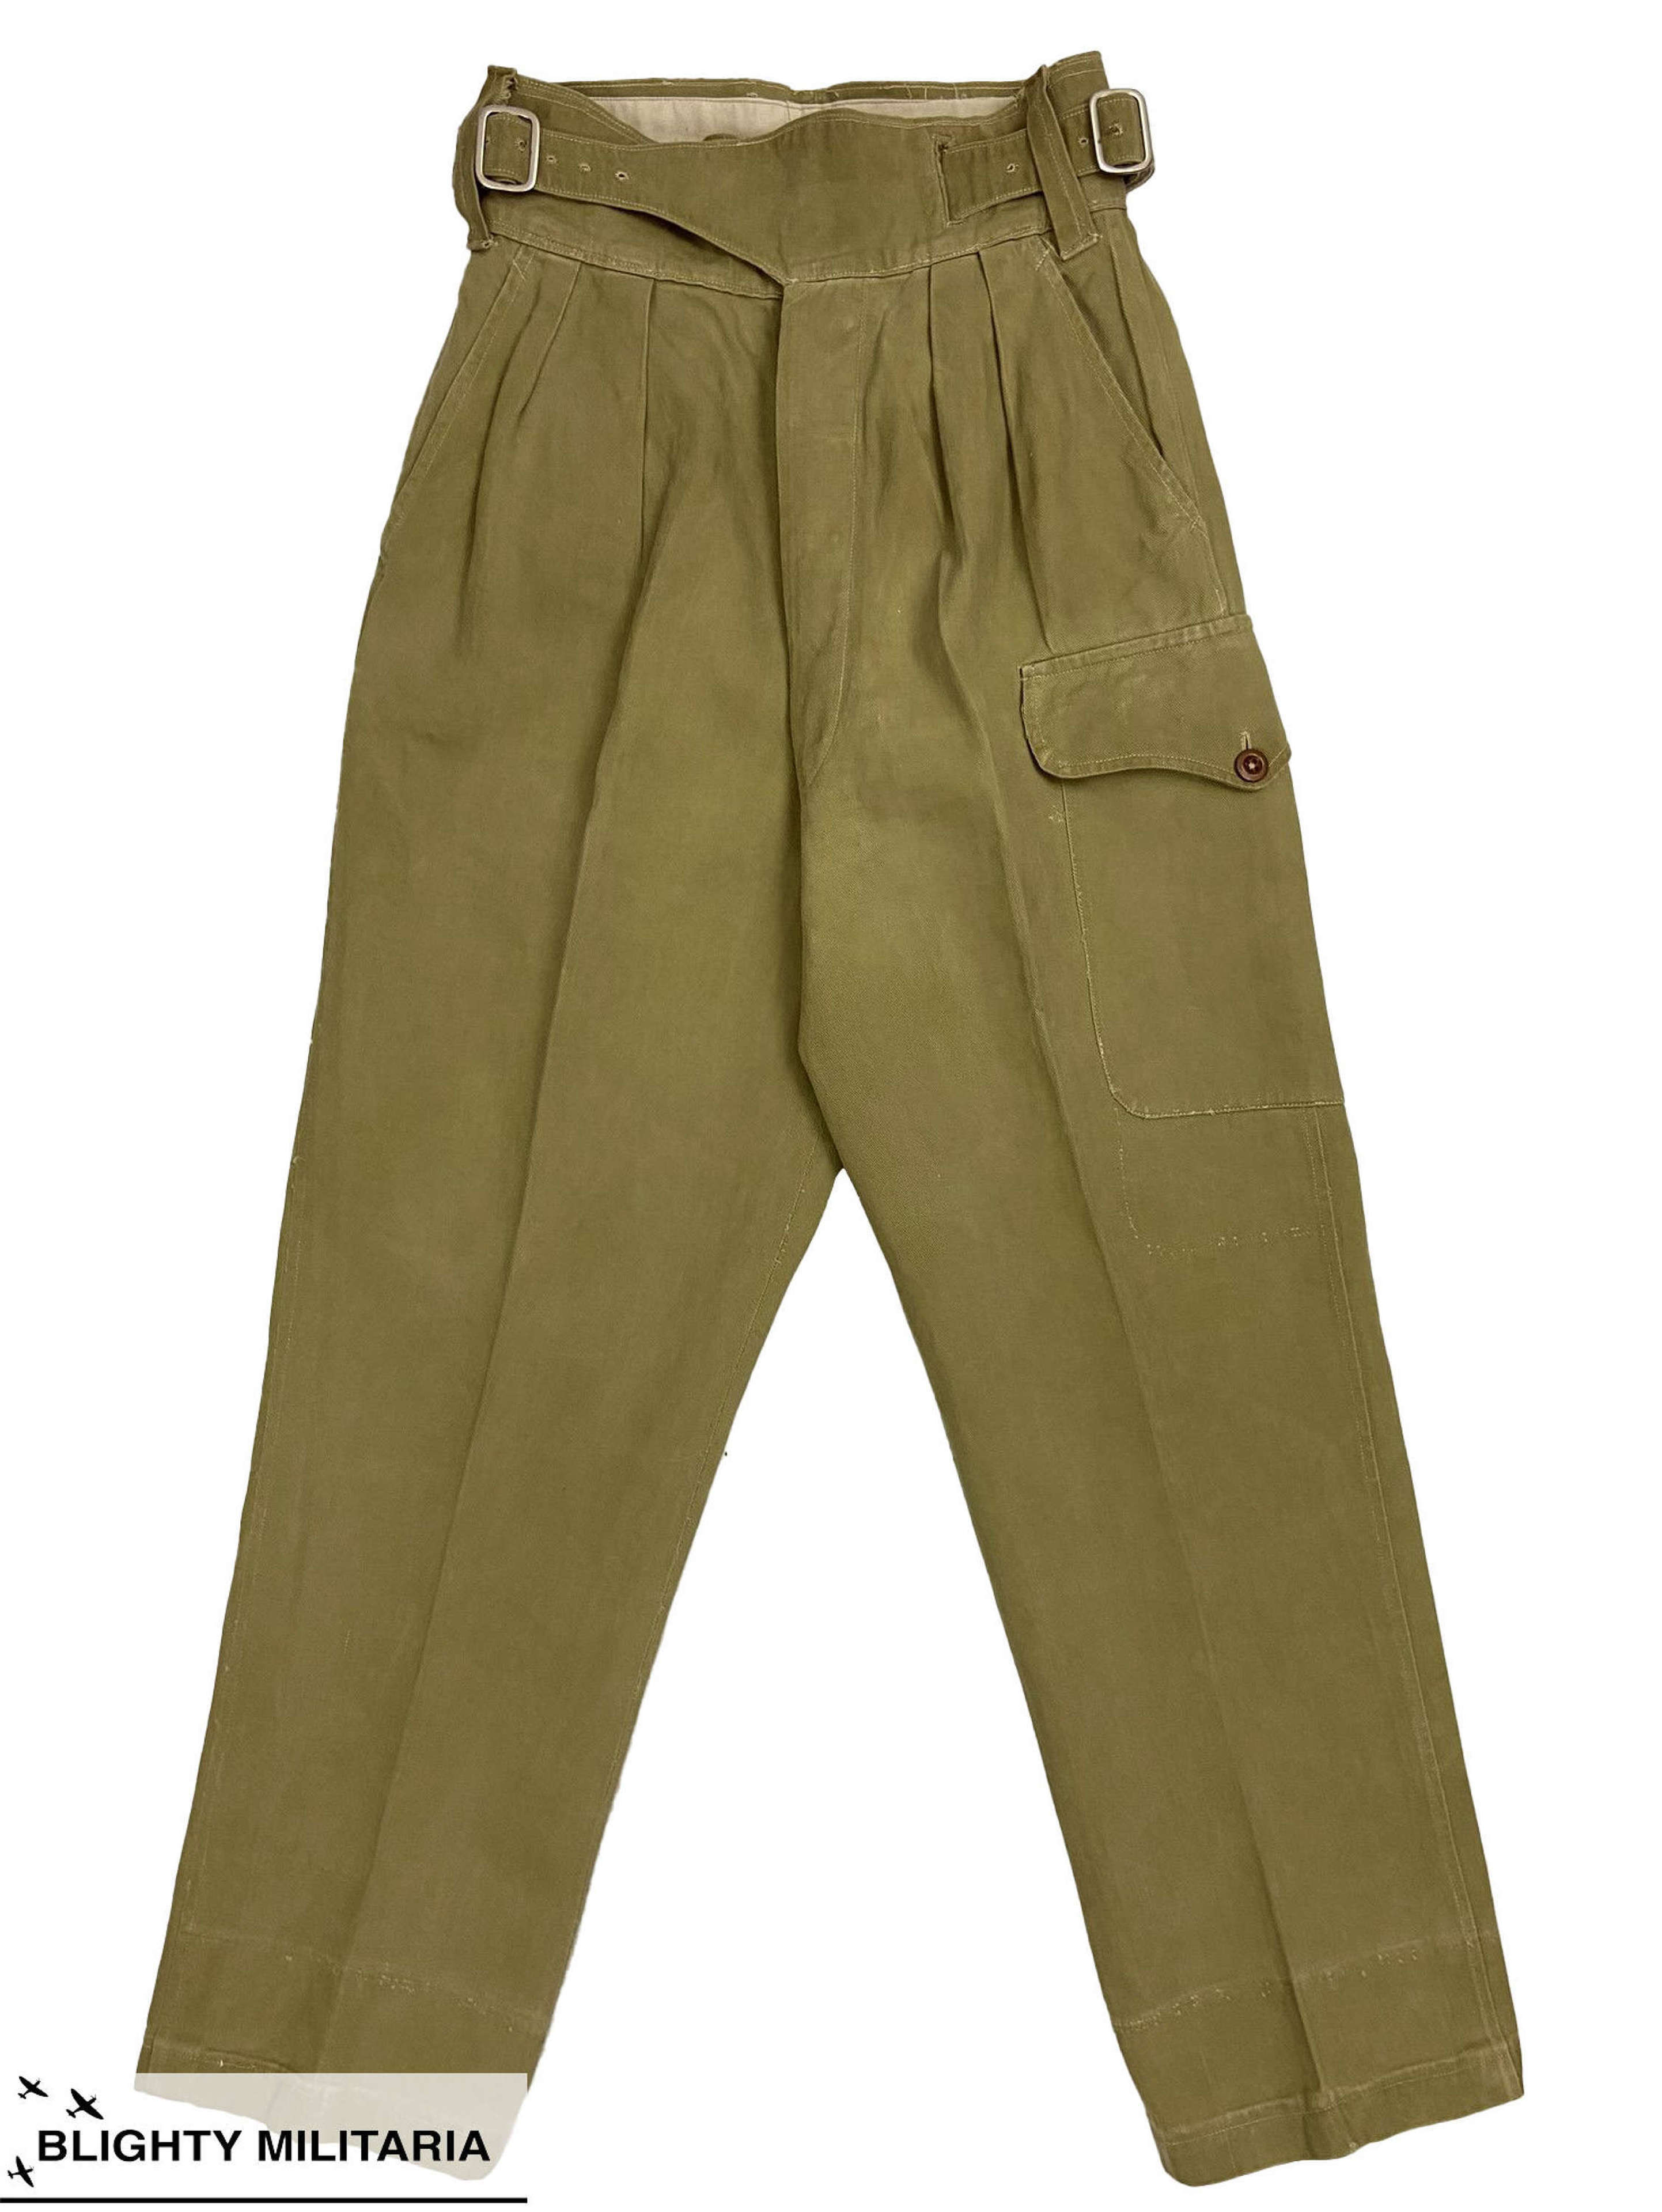 Original 1950s British Khaki Drill Trousers - 1950 Pattern Style